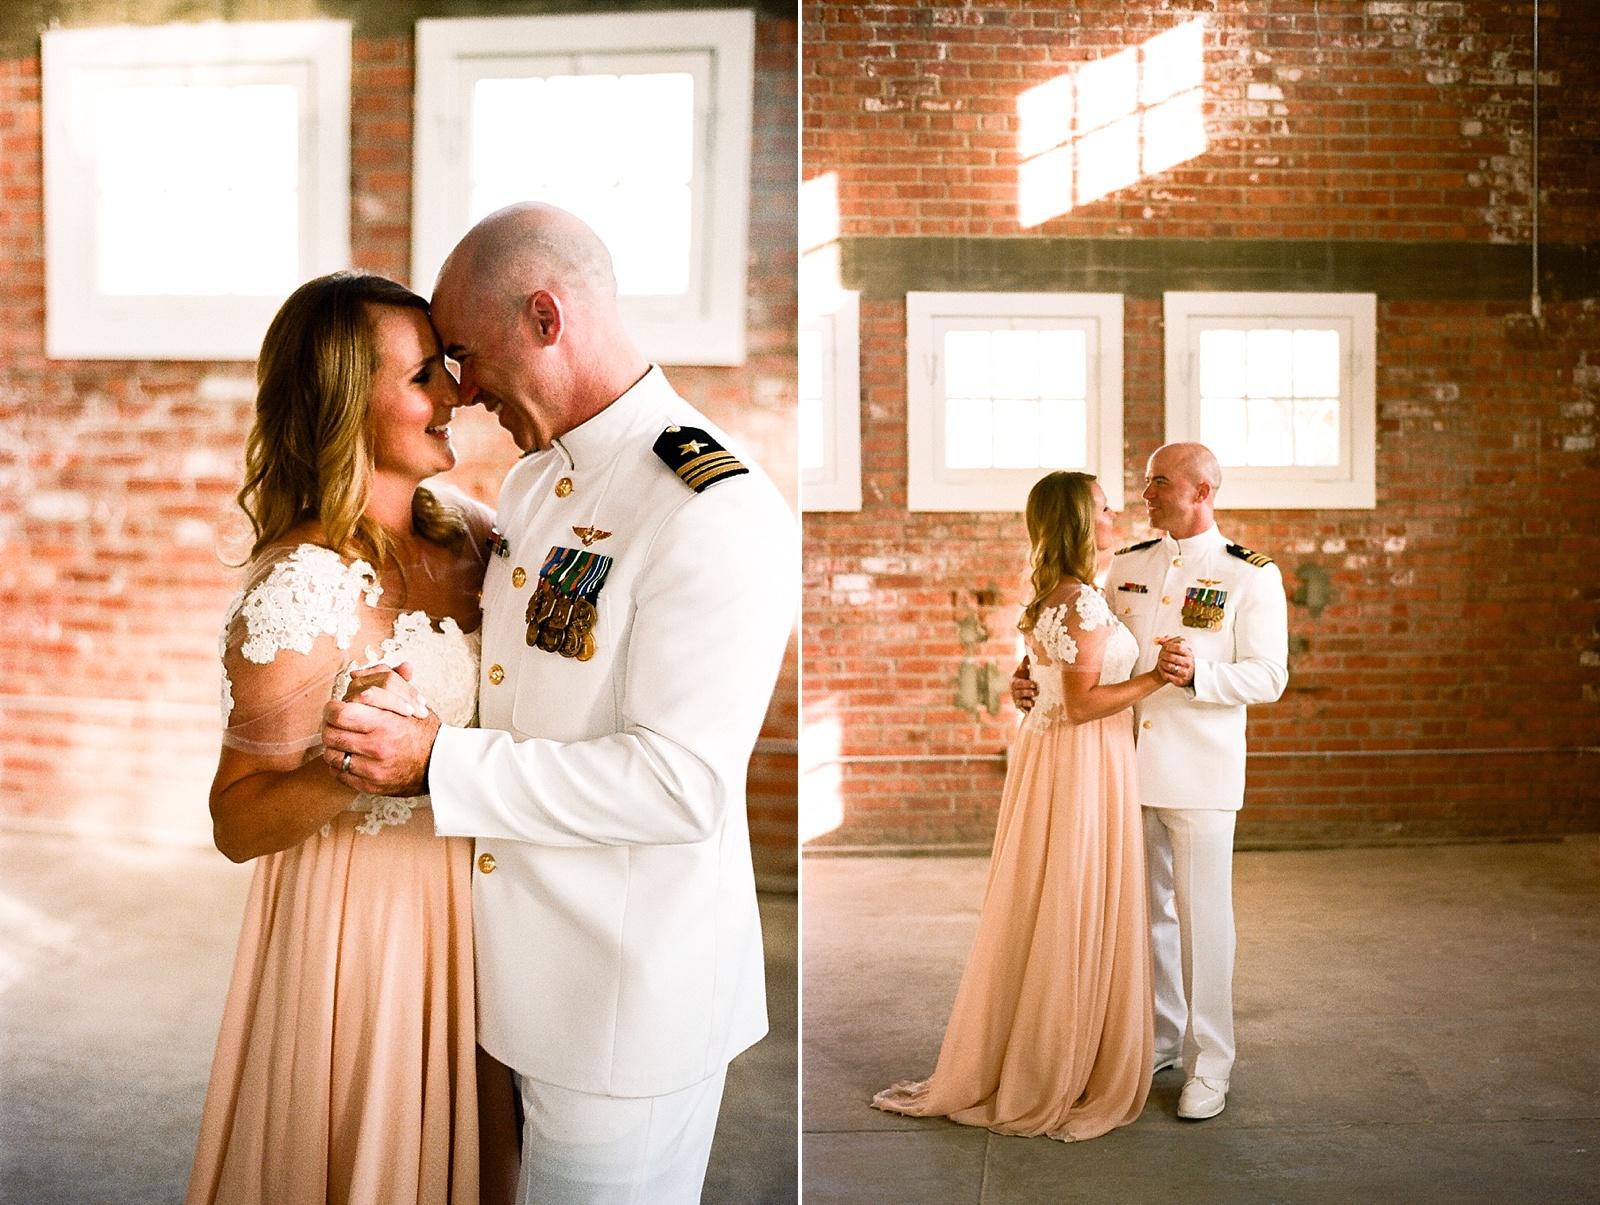 V&V Wedding at 828 by Lauren Nygard_film-017